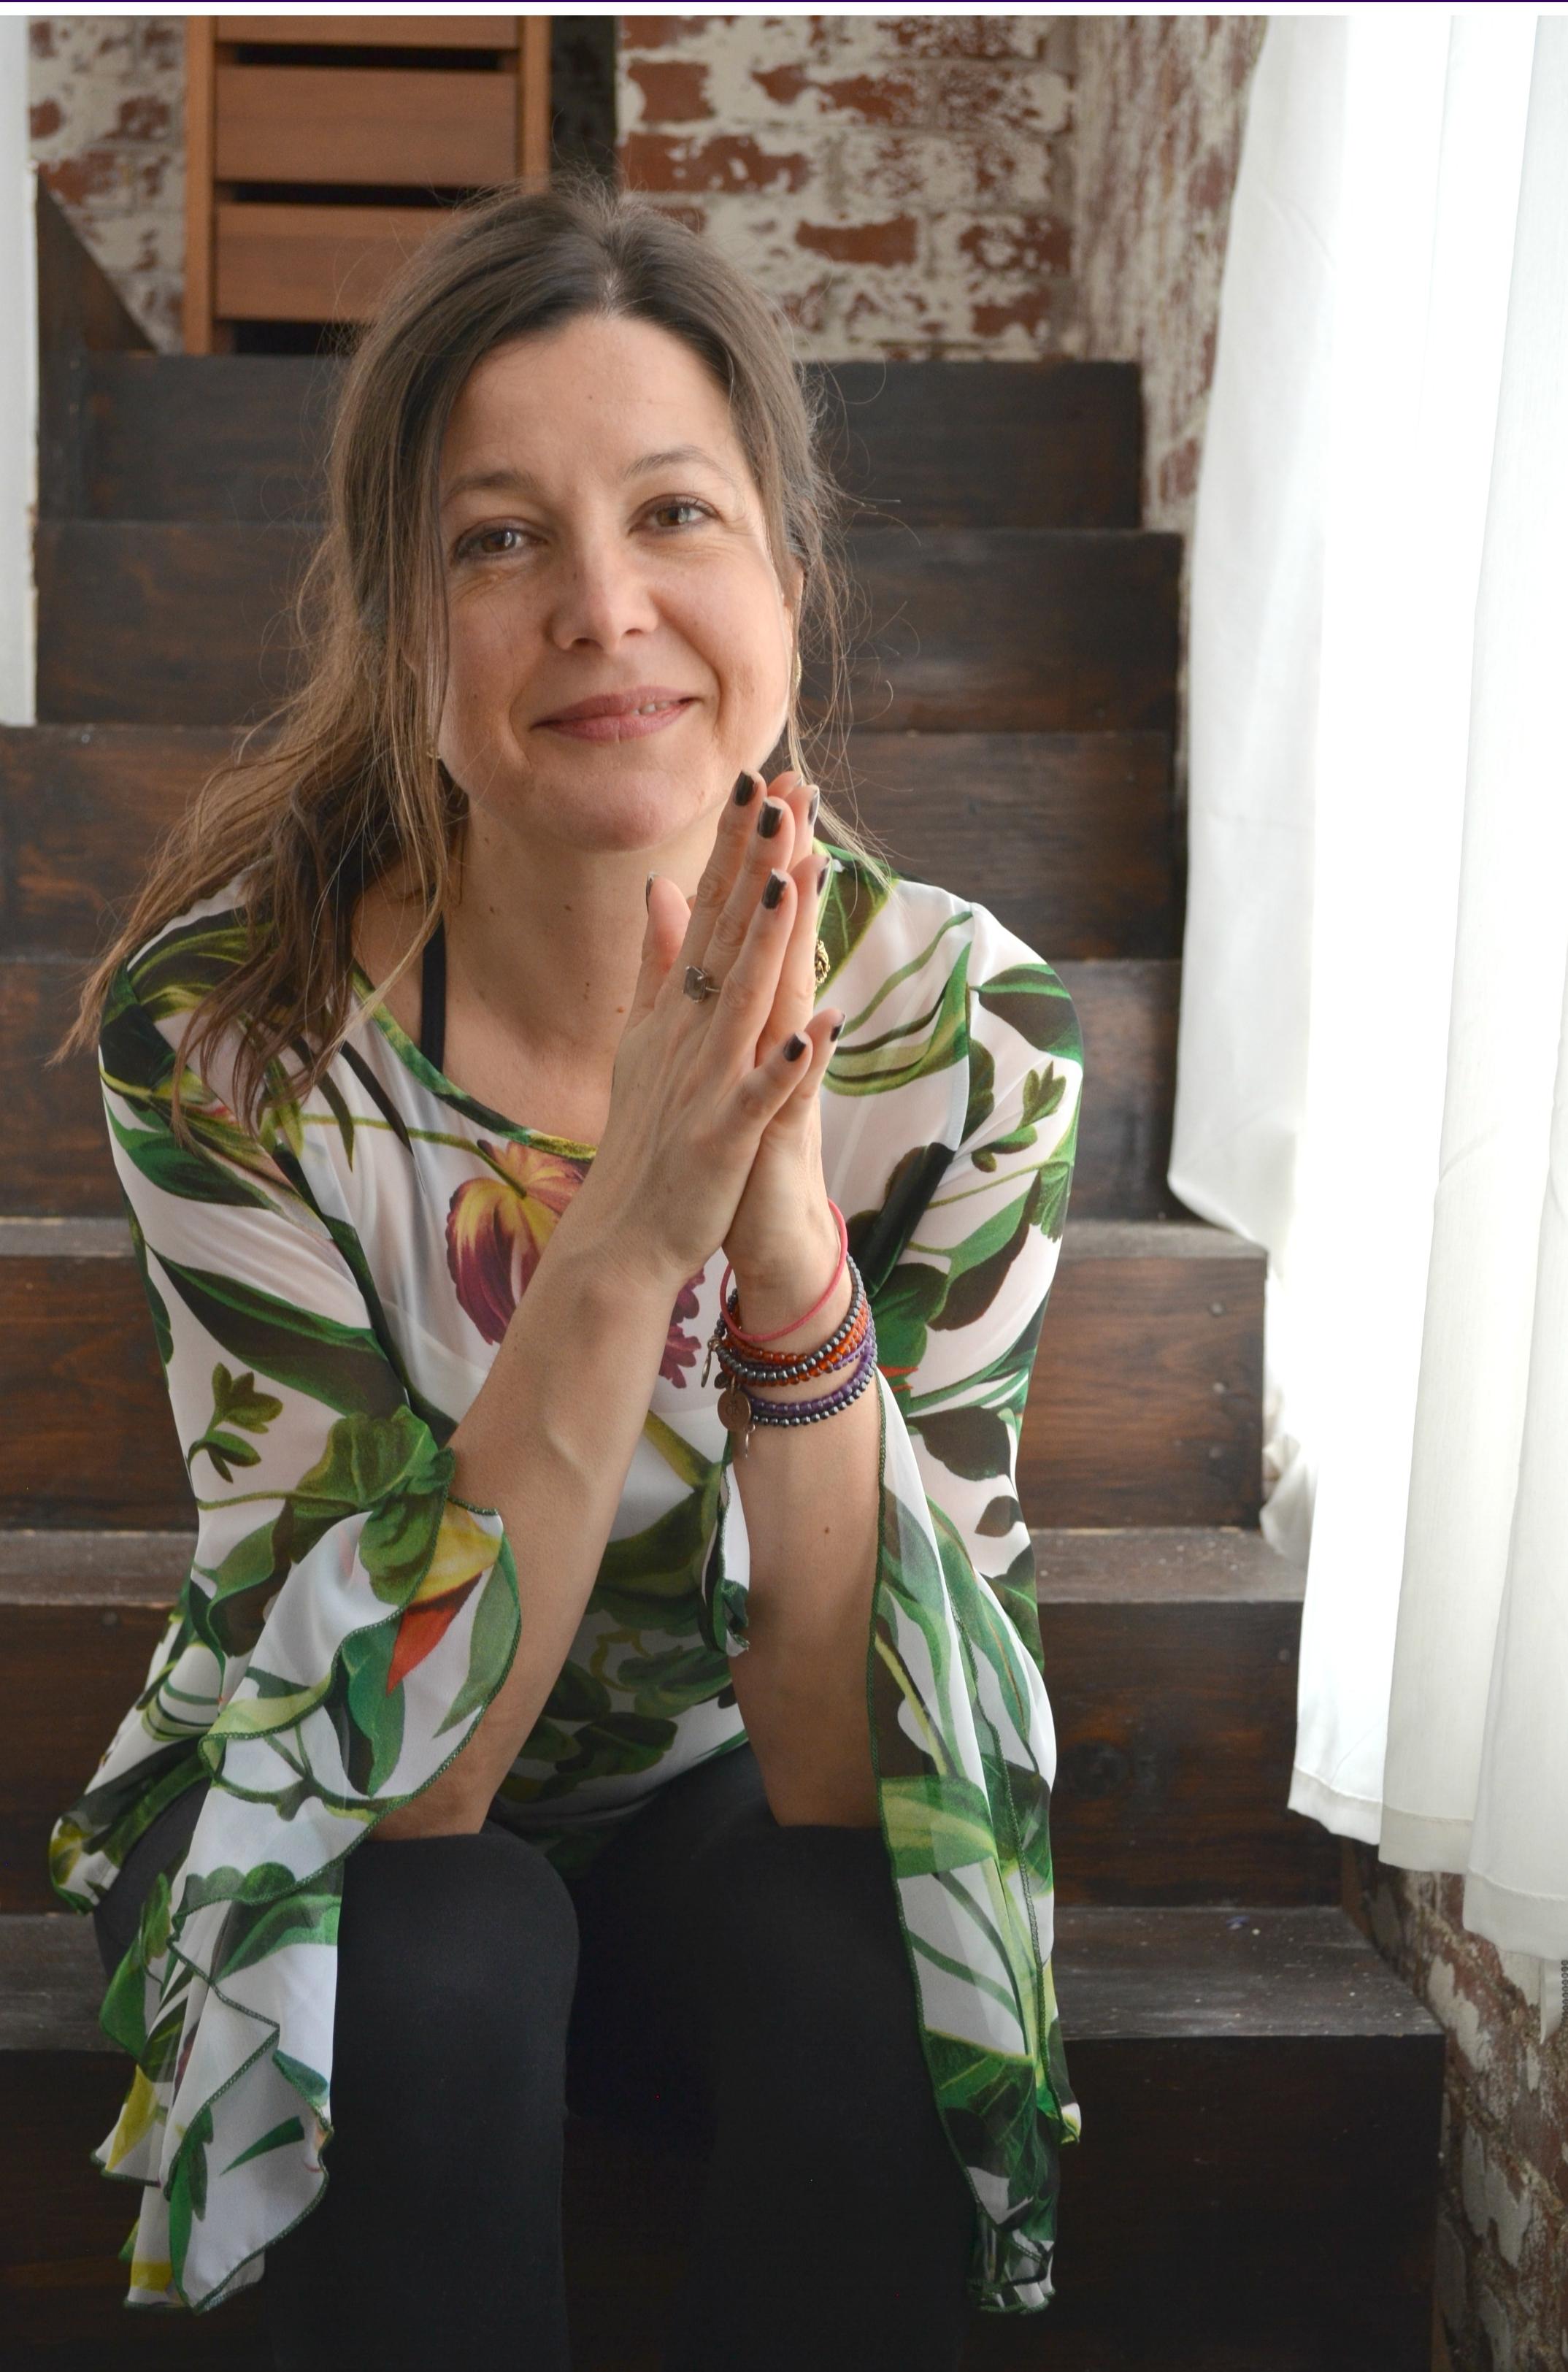 Natalie Biniasz